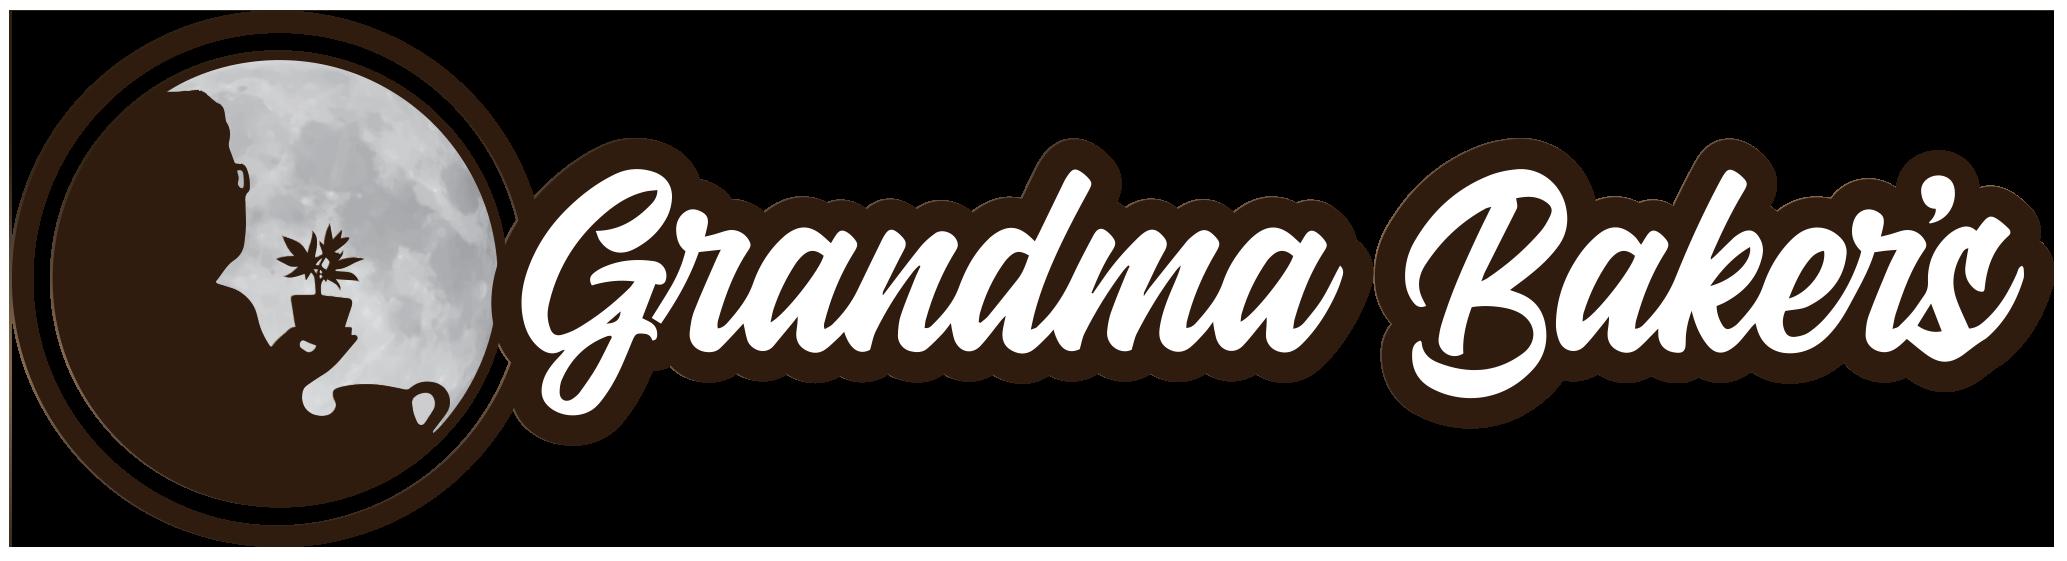 GrandmaBakers